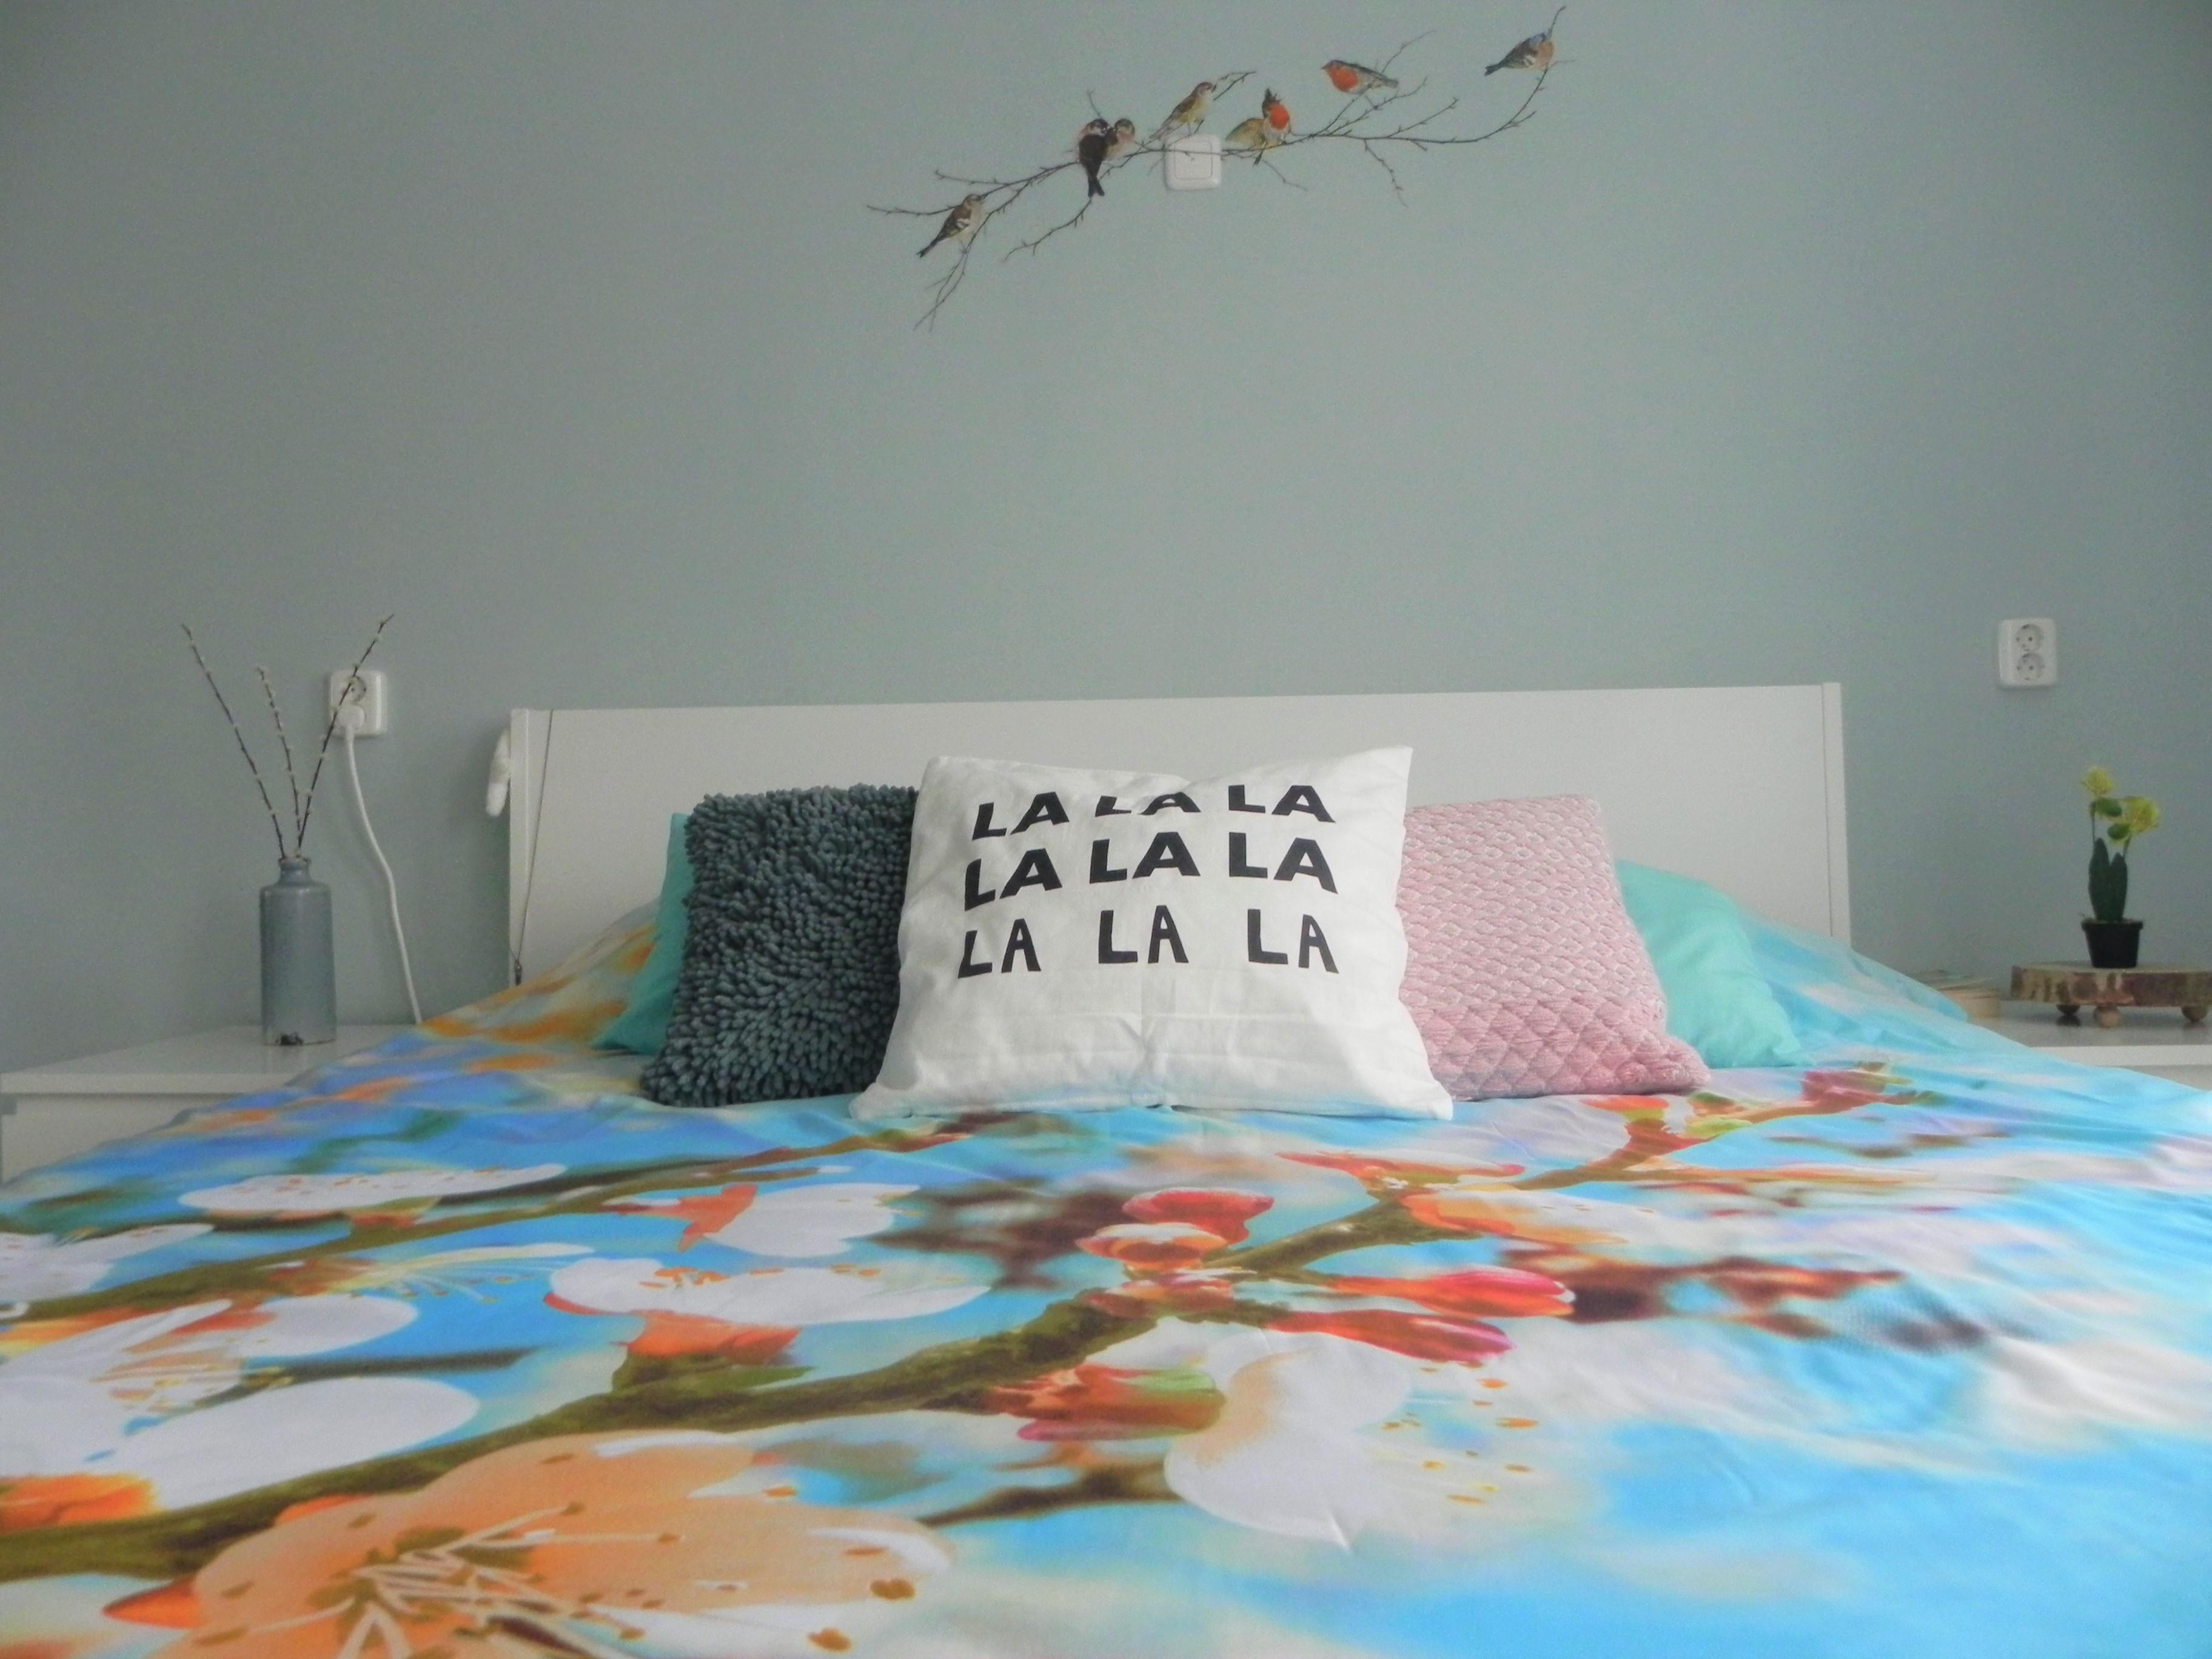 slaapkamer, master bedroom, bedden, bedden.nl, dekbedovertrek, binnenkijken, slaapkamer, interieur, wonen, slapen, blog, woonblog, lifestyleblog, mamablog, La Log.nl